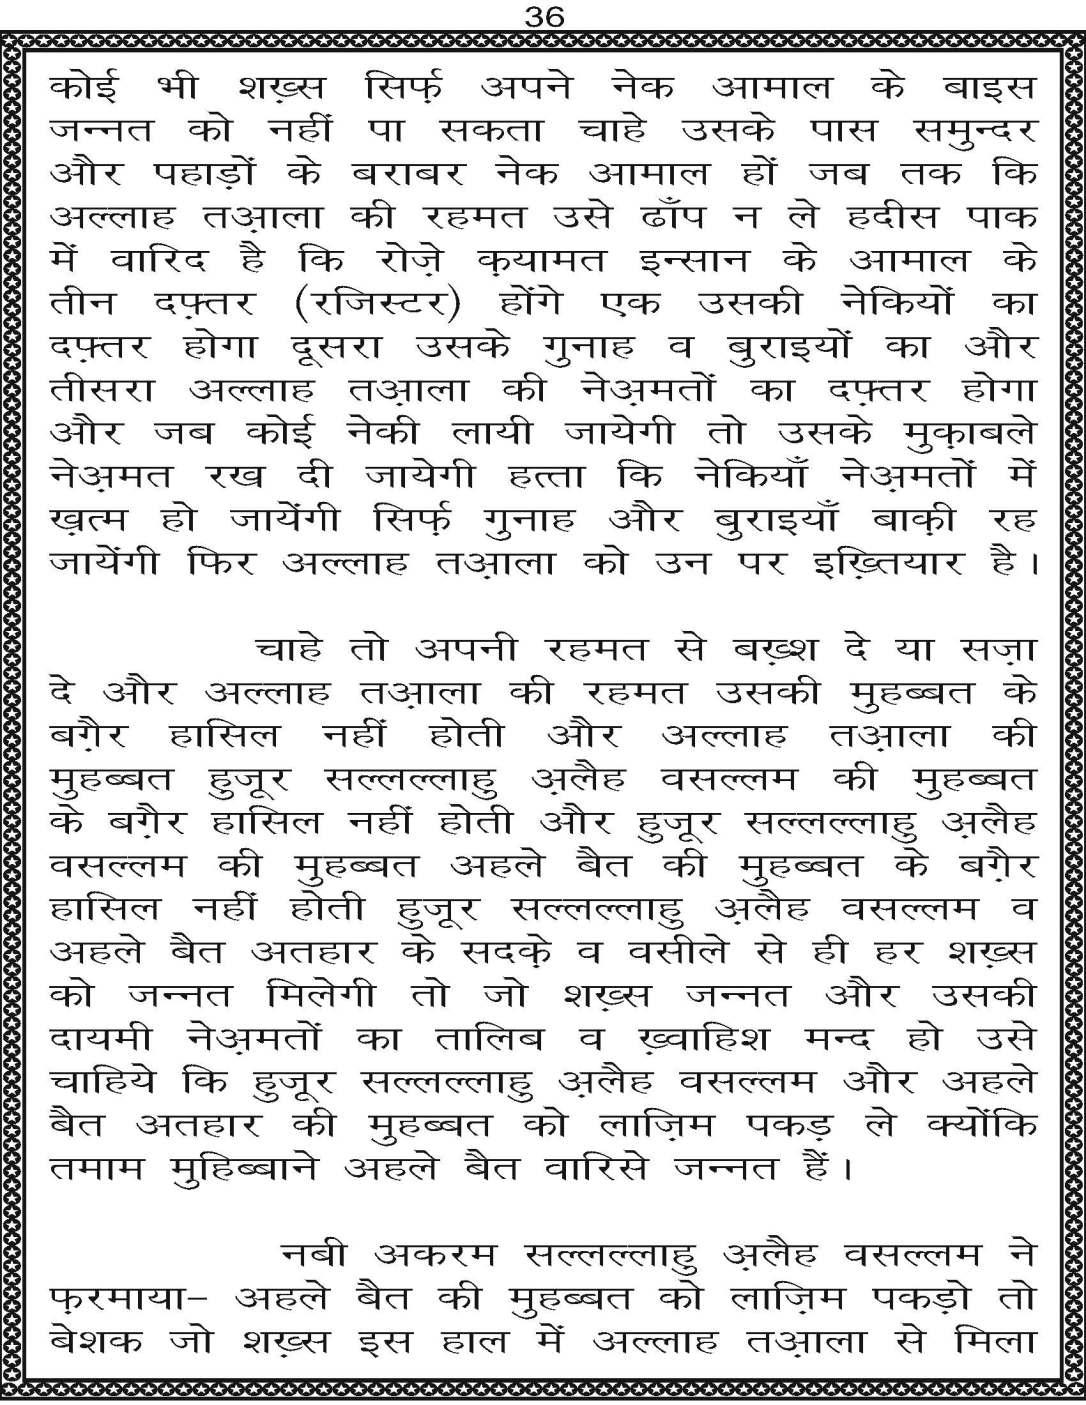 AzmateTaziyadari_Page_036